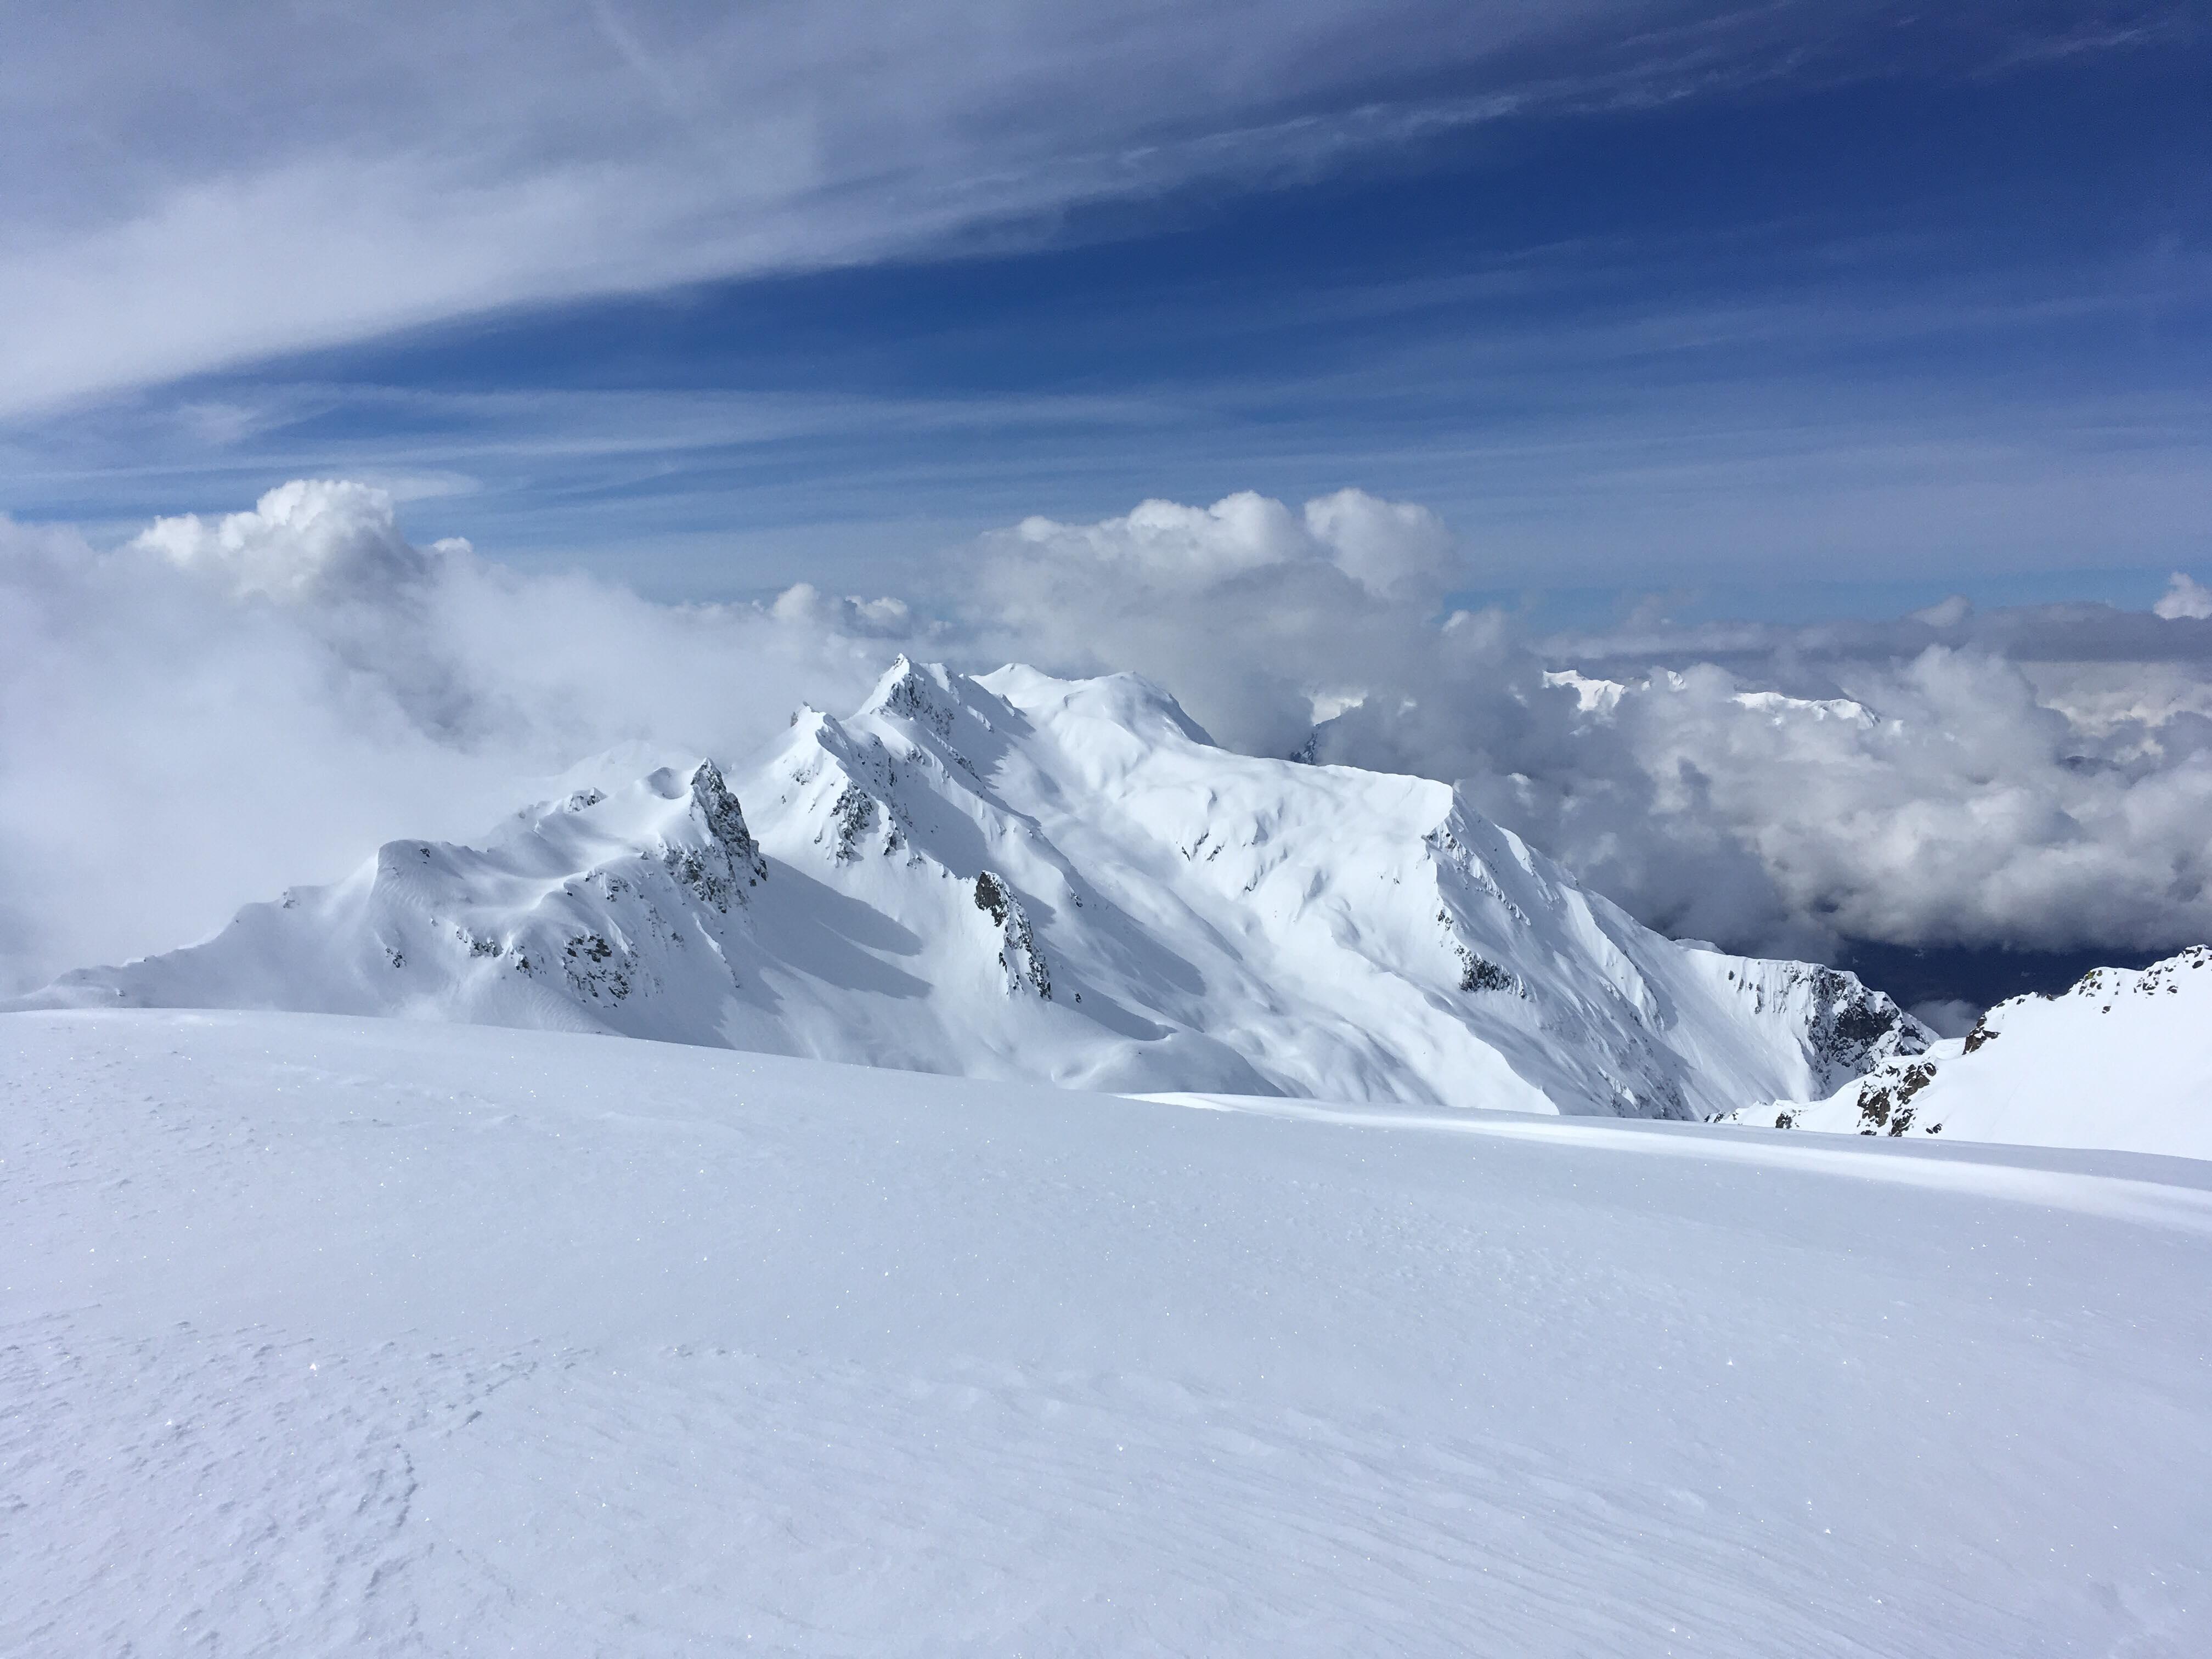 Col de la Louze snowboard 12